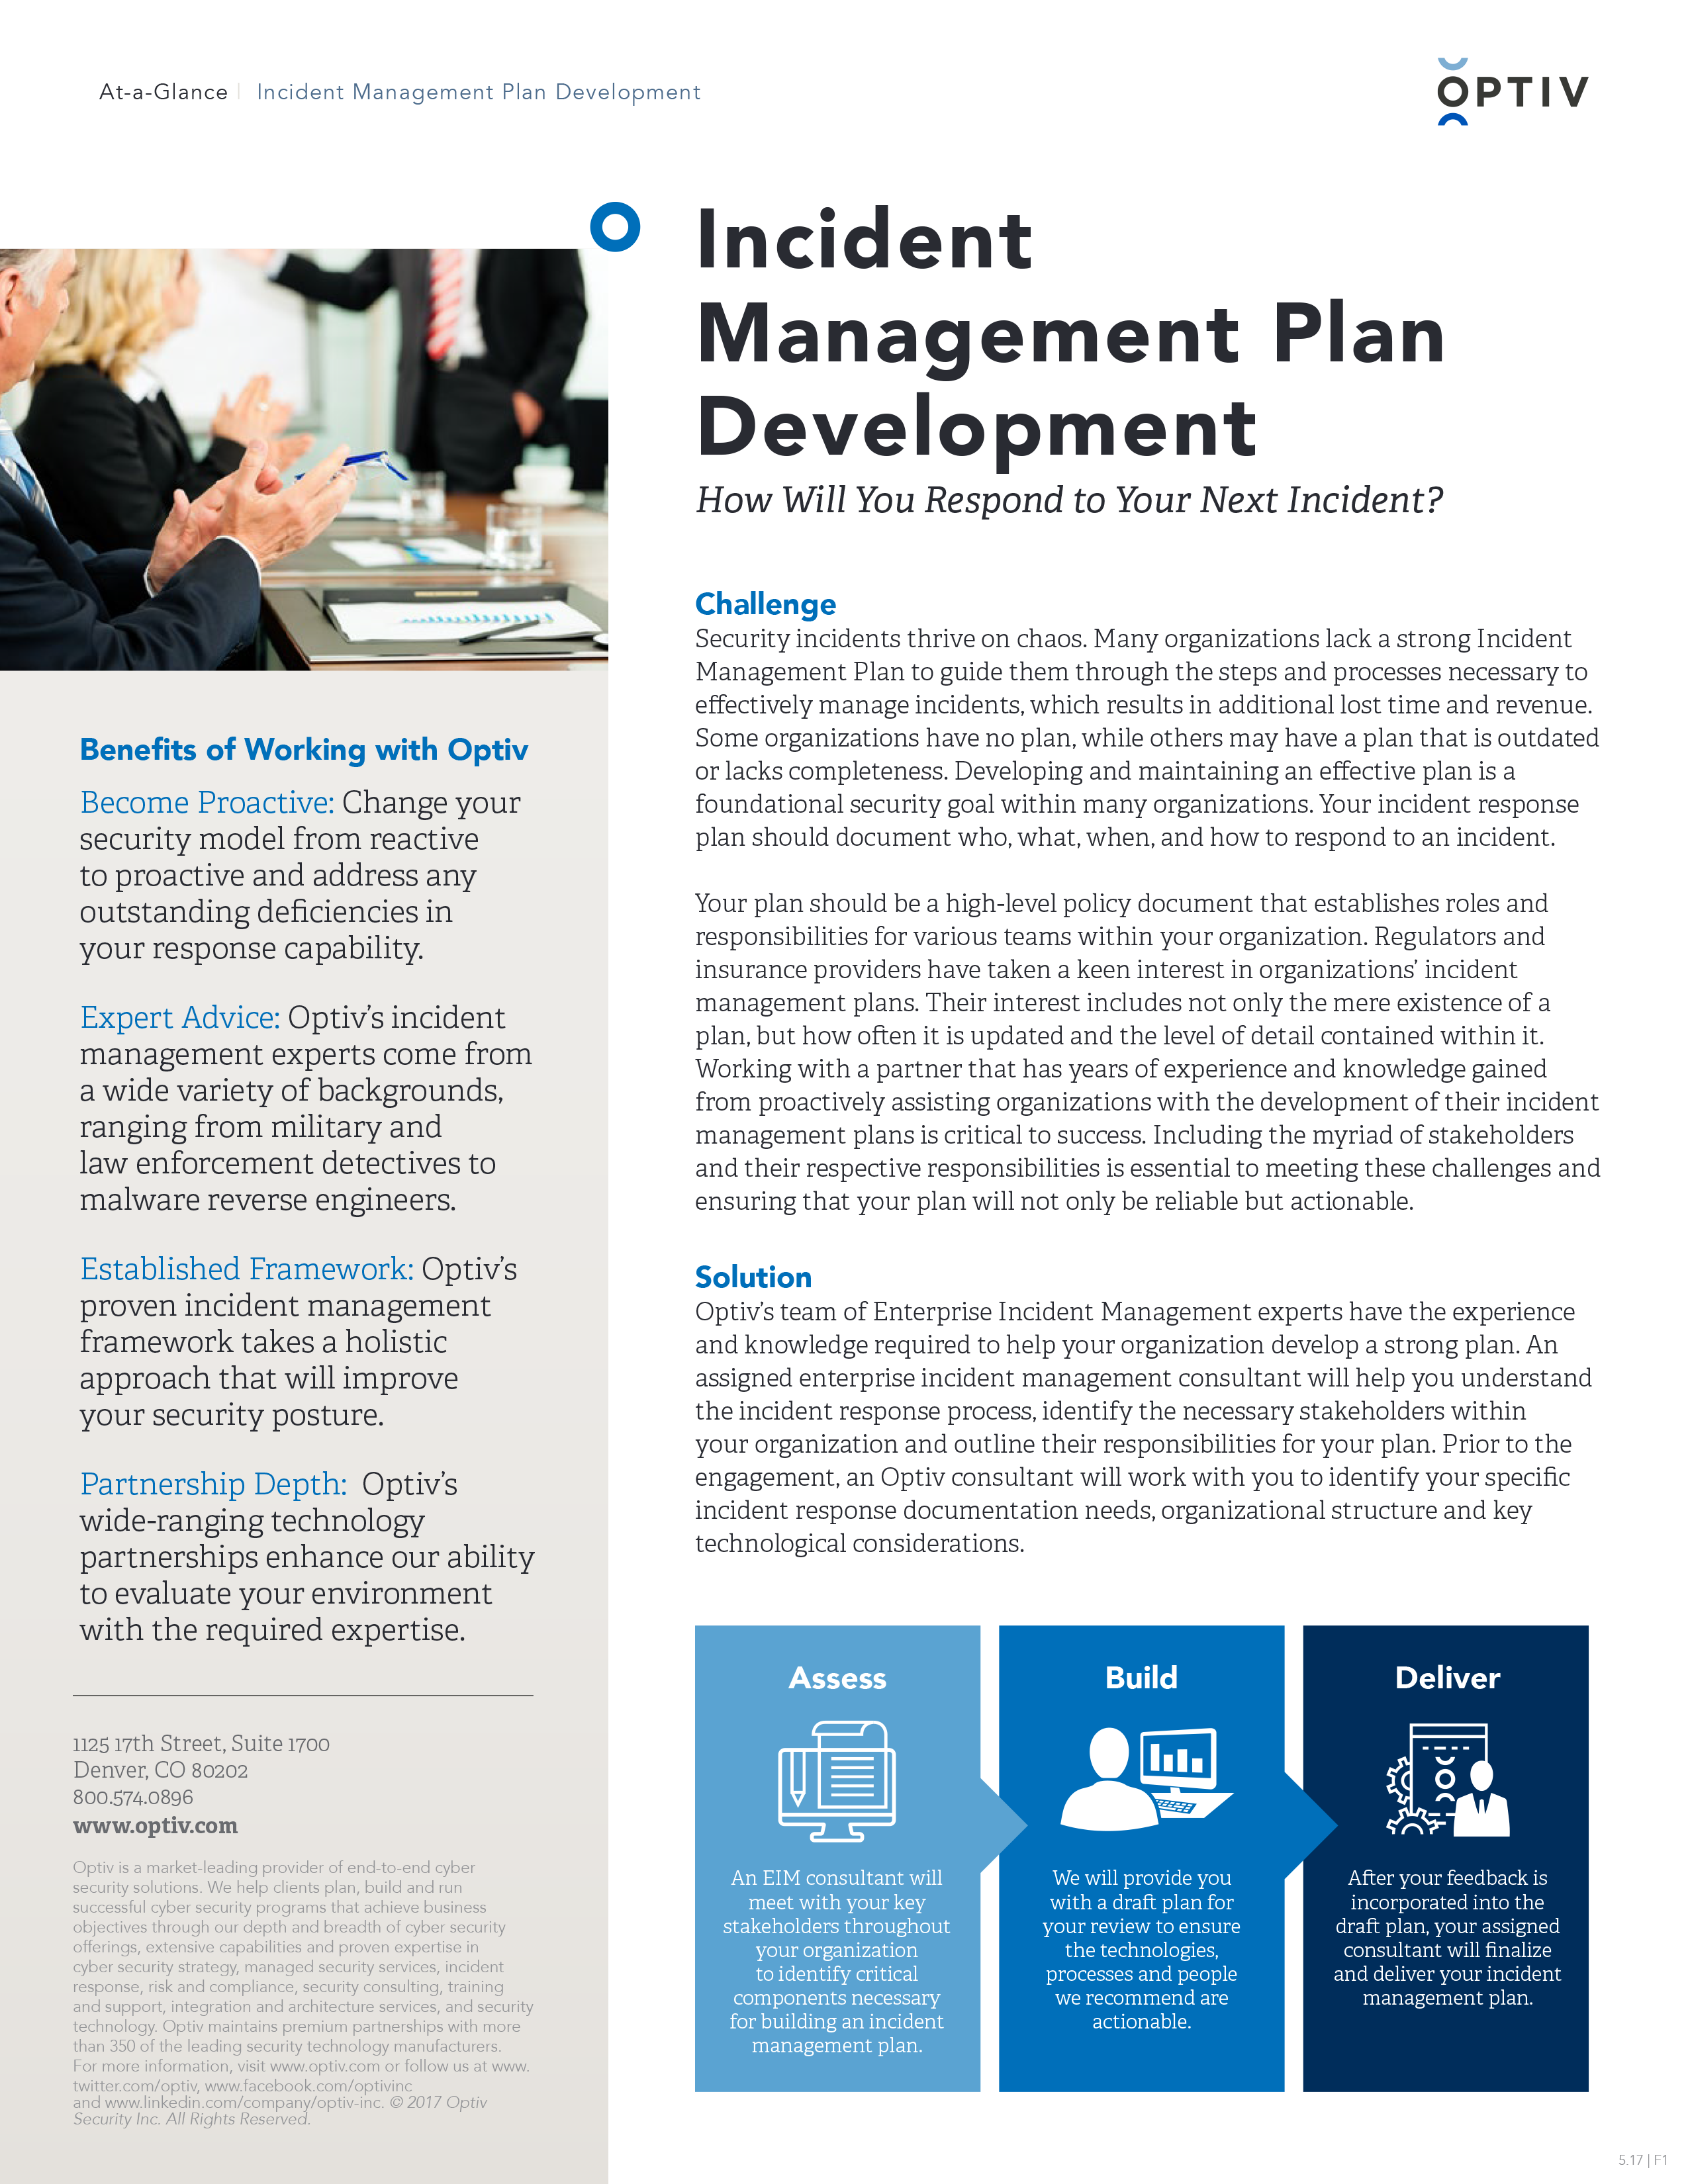 Incident Management Plan Development